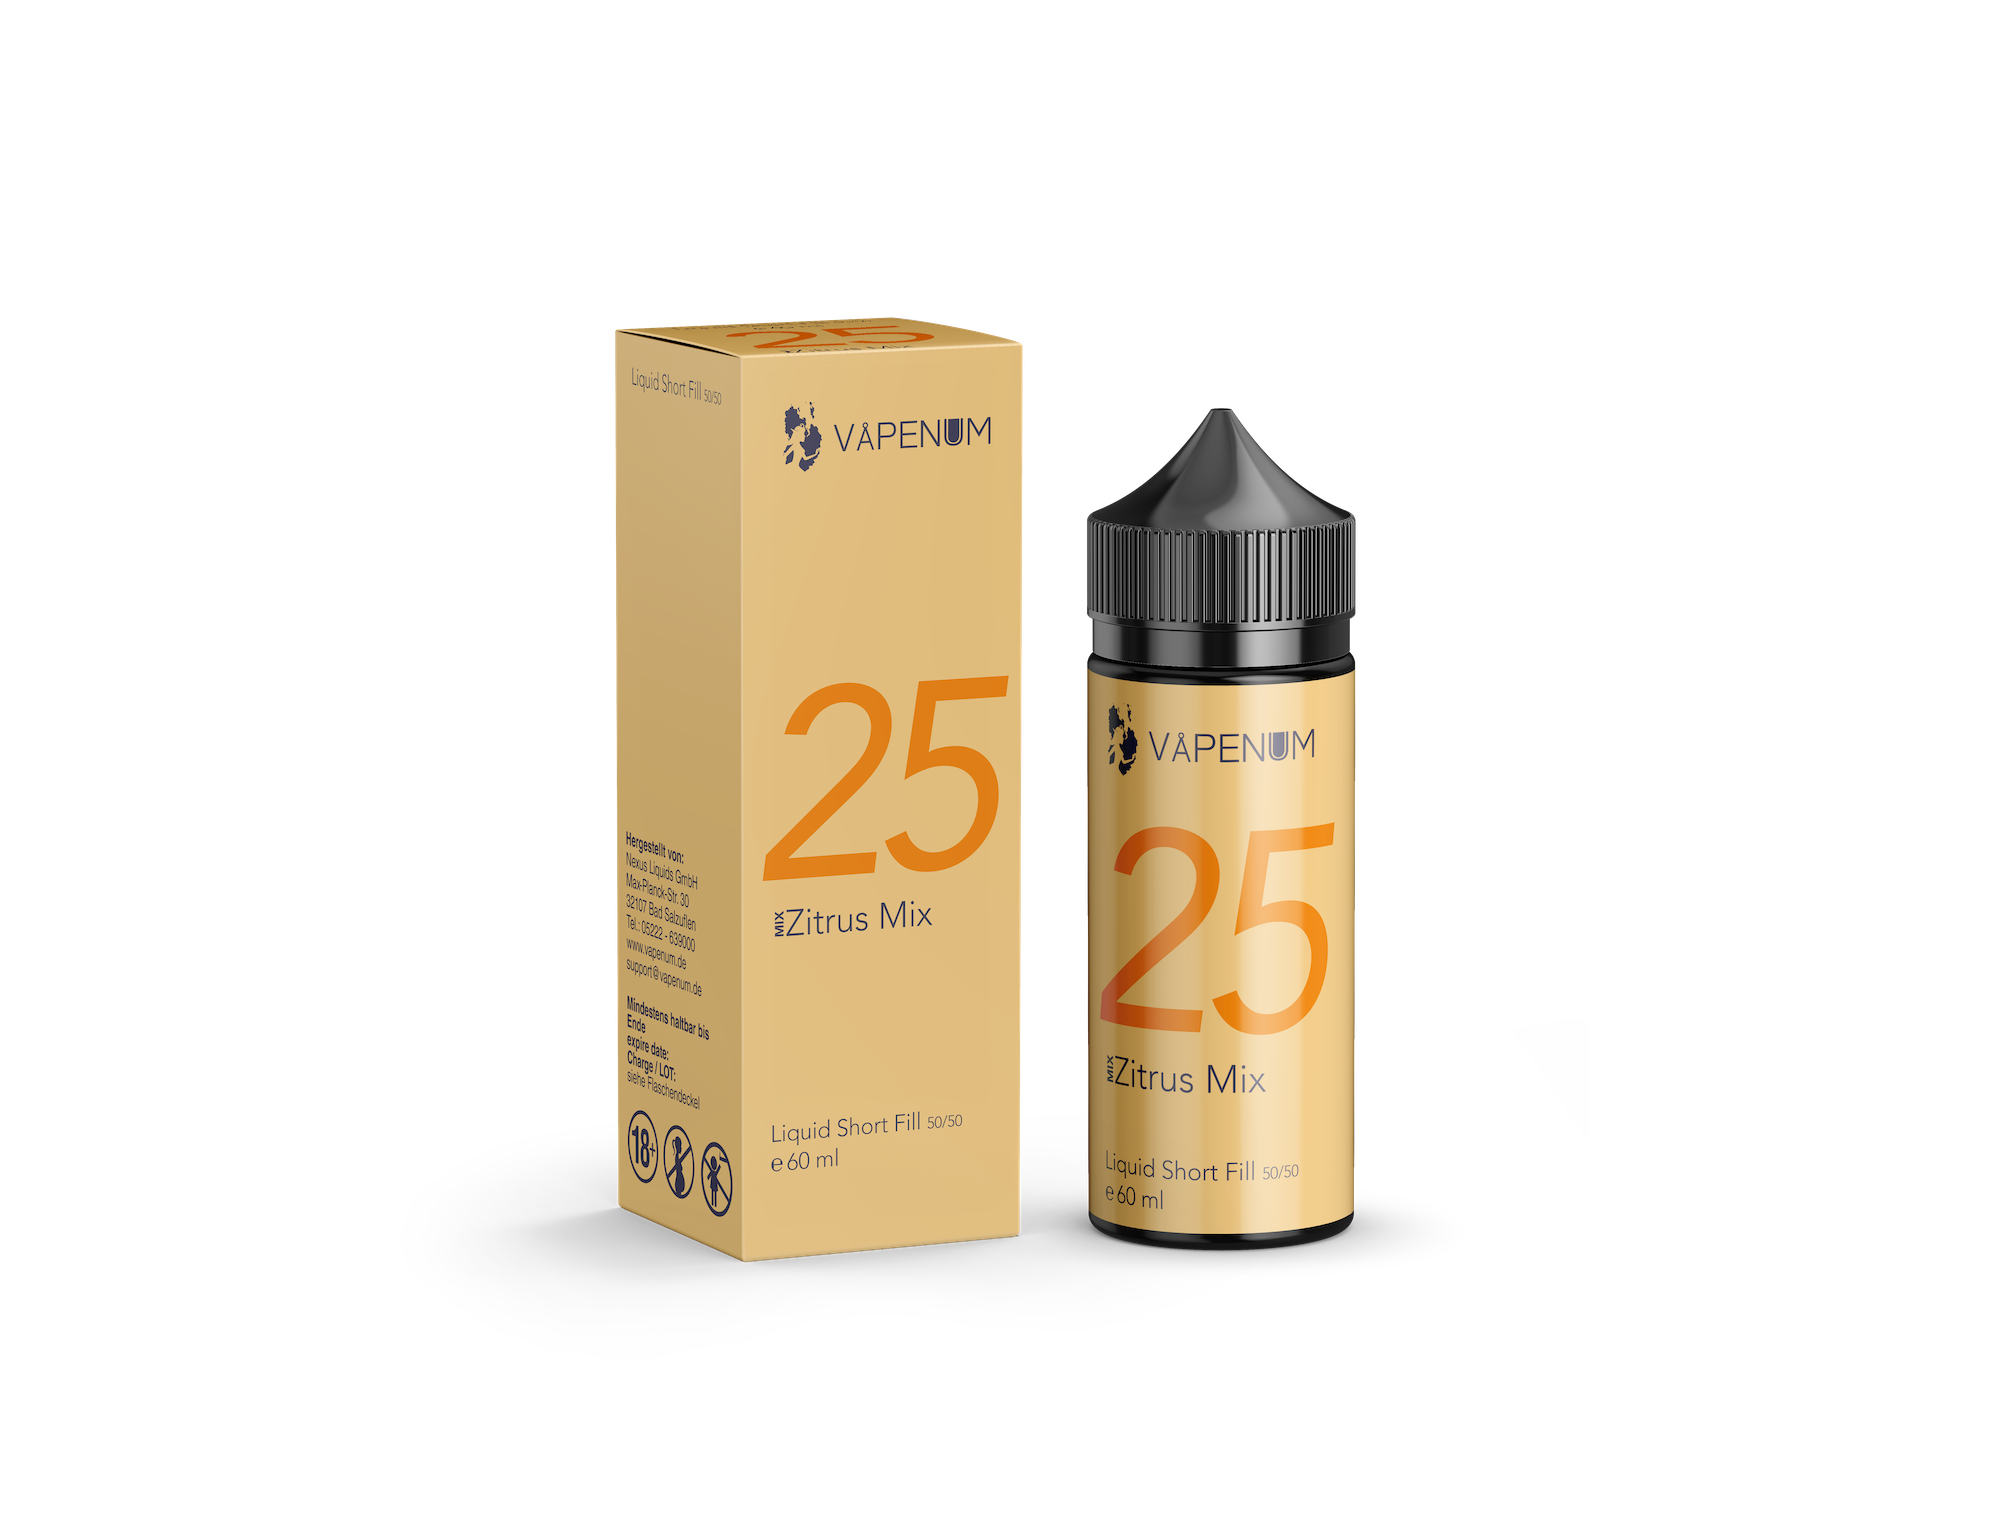 Vapenum Shortfill Mix 25 Zitrus Mix